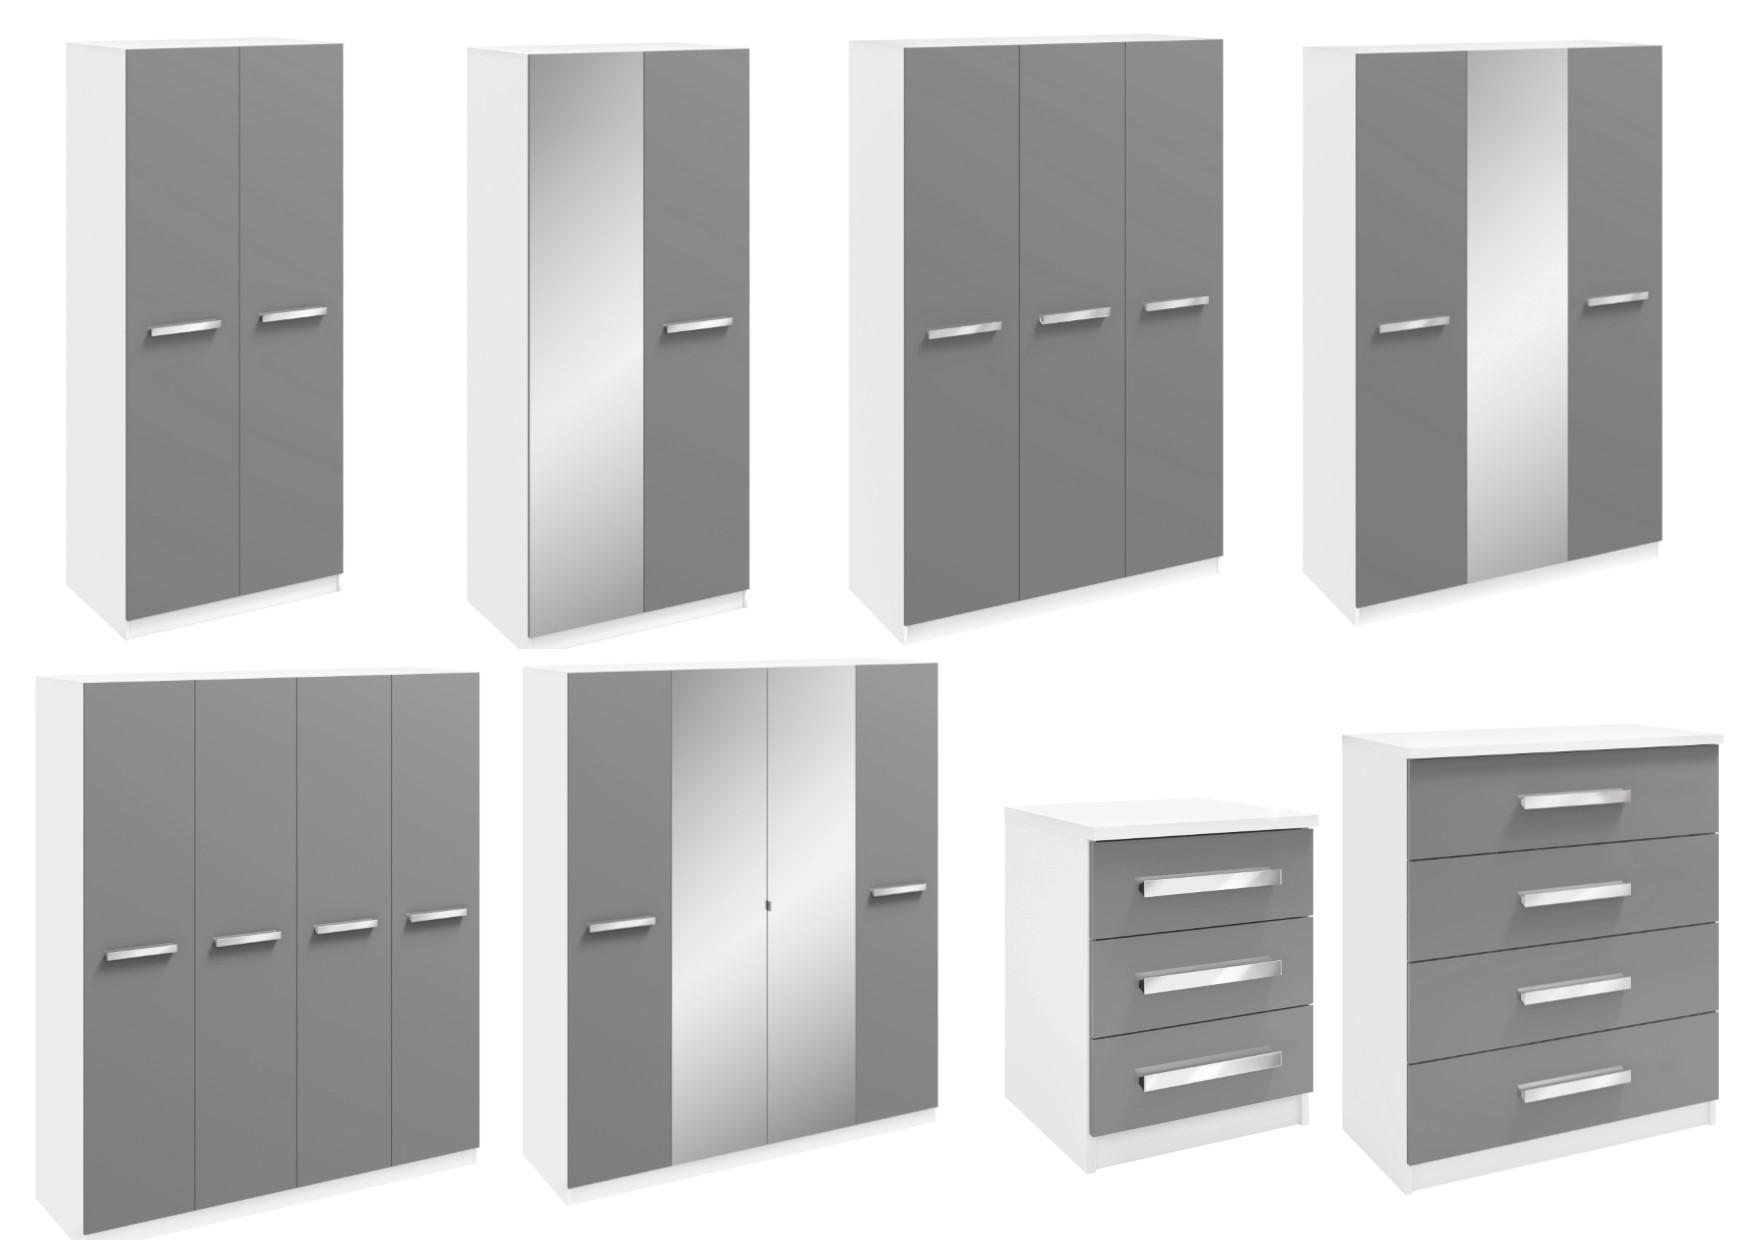 Moritz White Grey High Gloss Bedroom Furniture Wardrobes Bedside Drawers Ebay